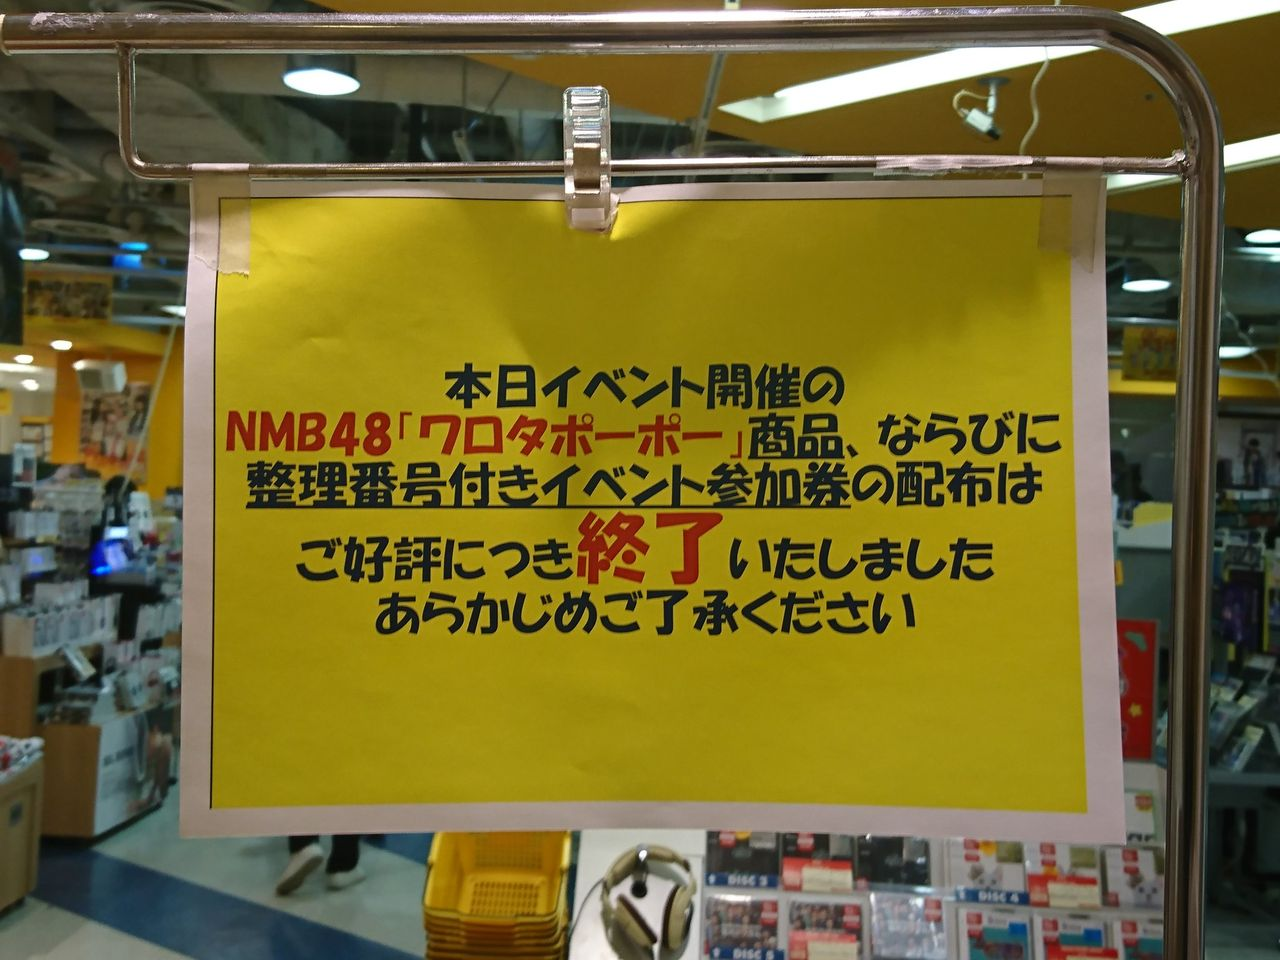 【NMB48】『ワロタピーポー』TSUTAYA戎橋、渋谷TSUTAYA、タワレコ新宿 発売イベントまとめ